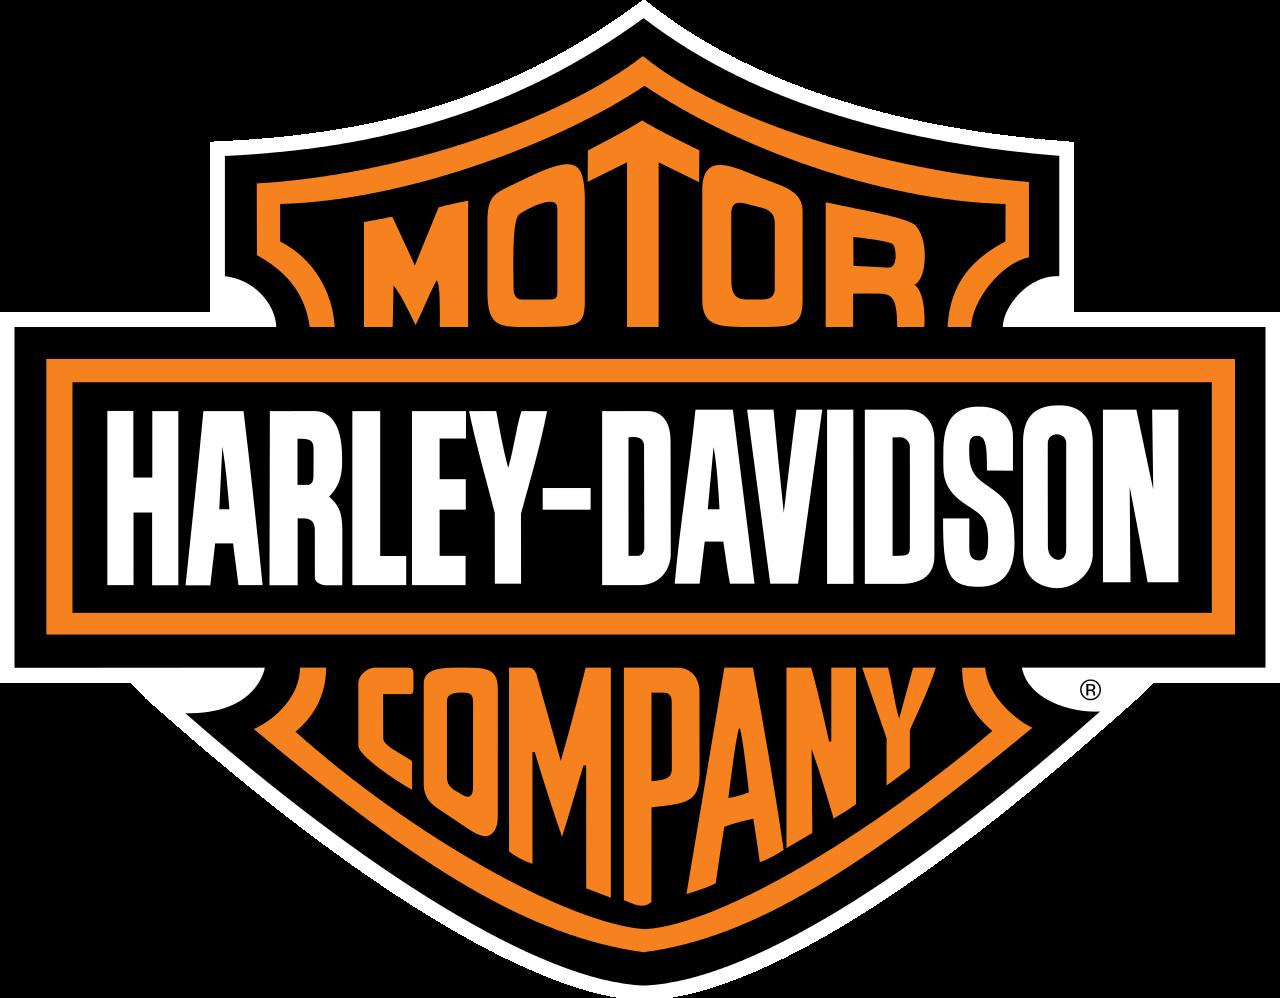 Harley-Davidson.svg